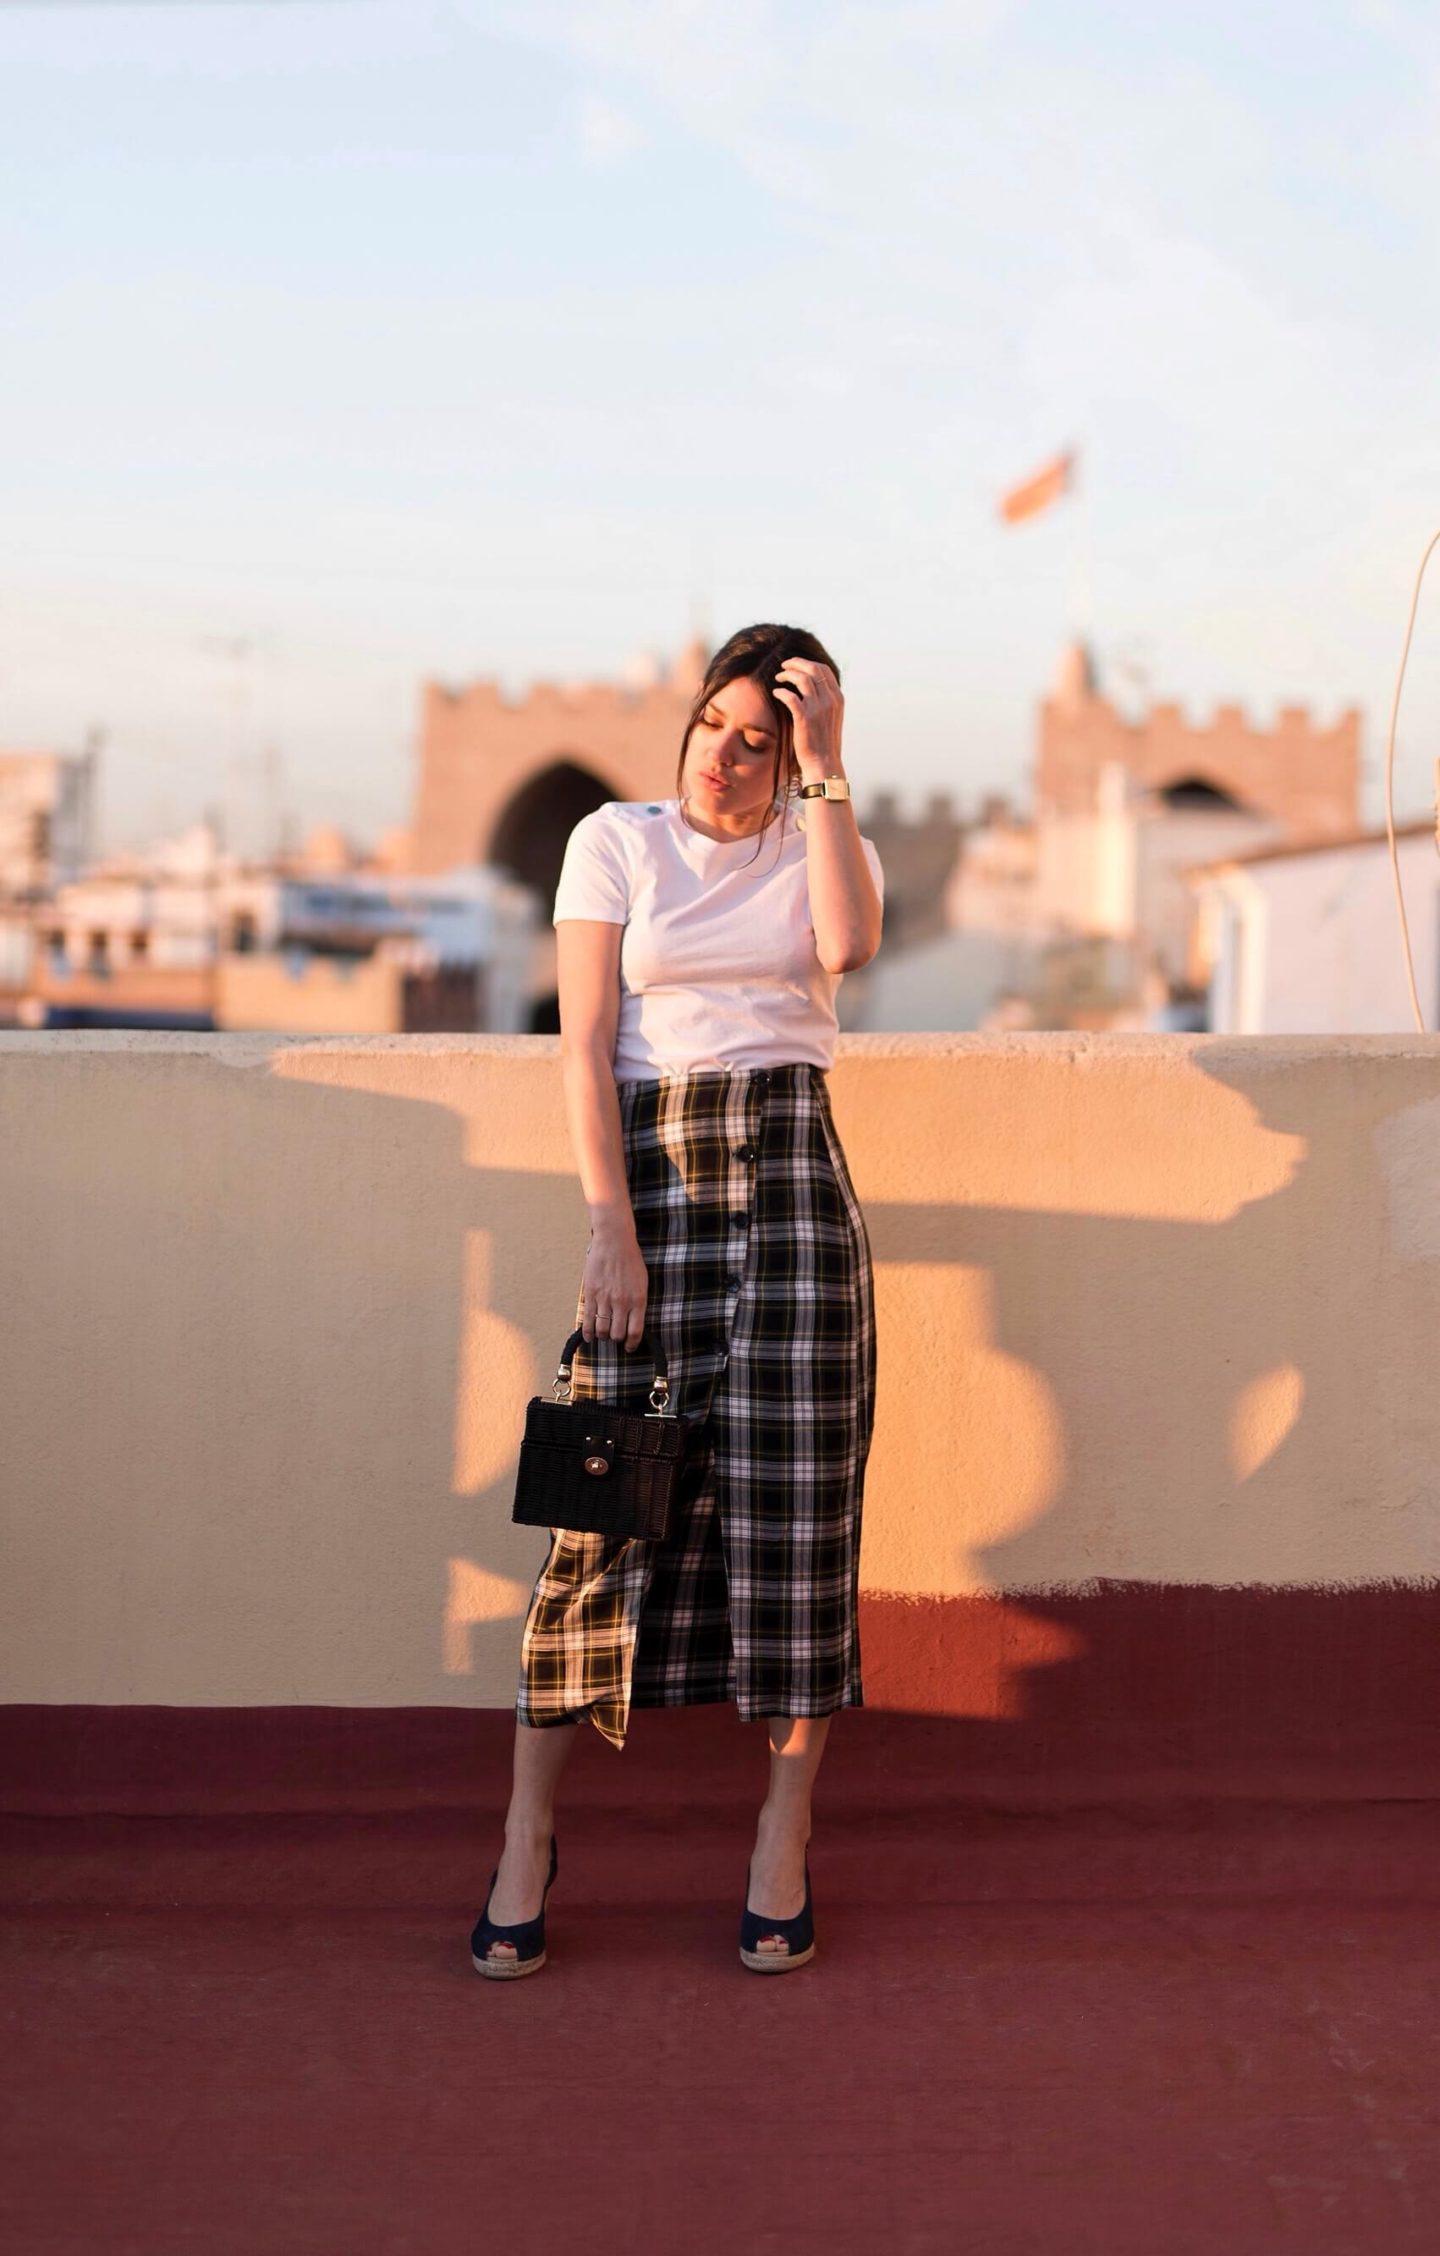 look sunset in Valance Espana Jupe midi à carreaux L'atelier d'al blog mode look sunset in Valance Espana Jupe midi à carreaux L'atelier d'al blog mode